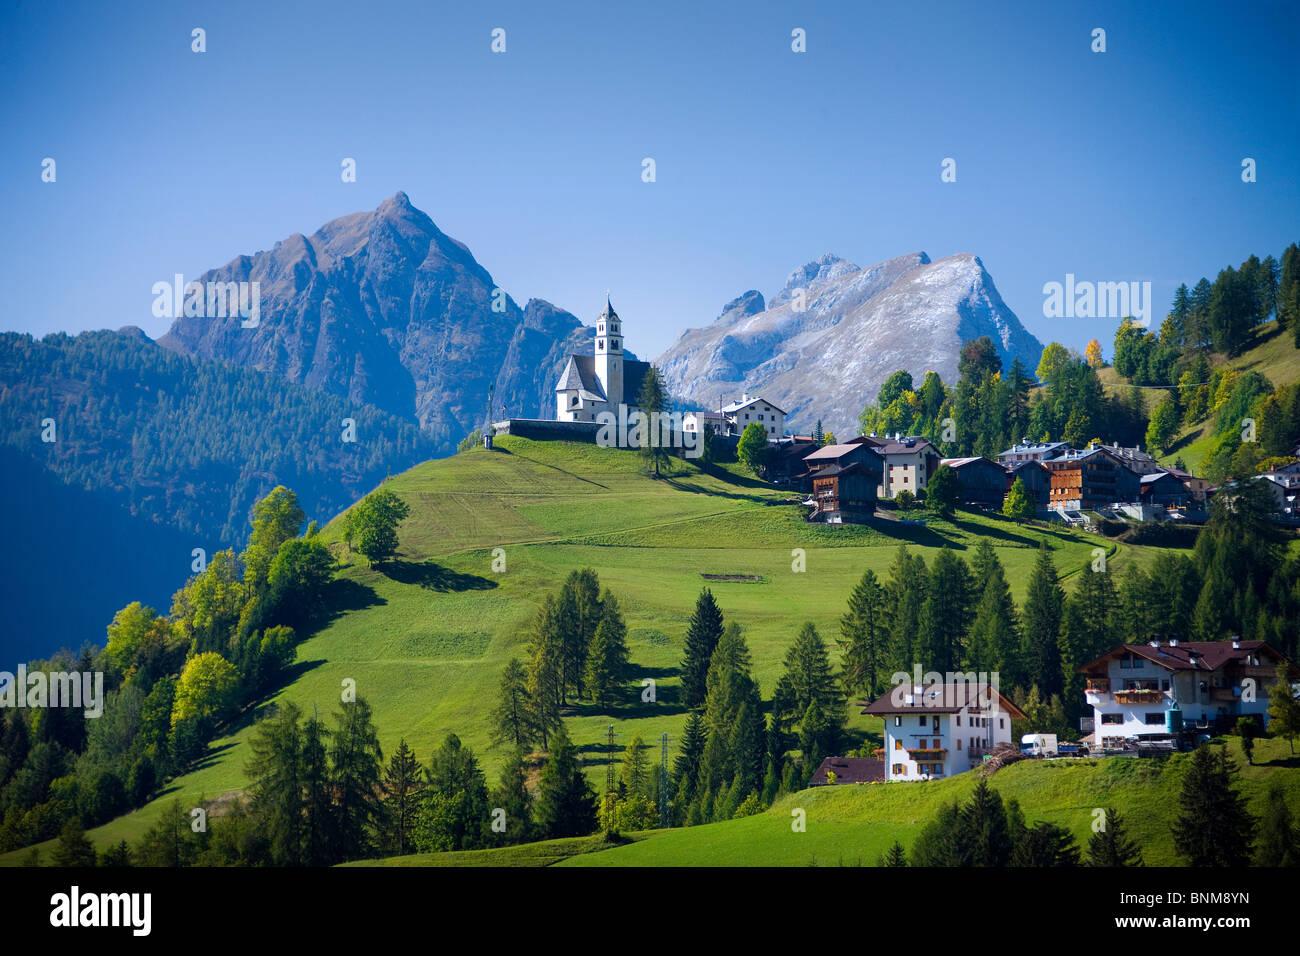 Reisen Italien Alpen Venetien Dolomiten Cadore Hill Holz Wald Wiesen Reisen, Stockbild